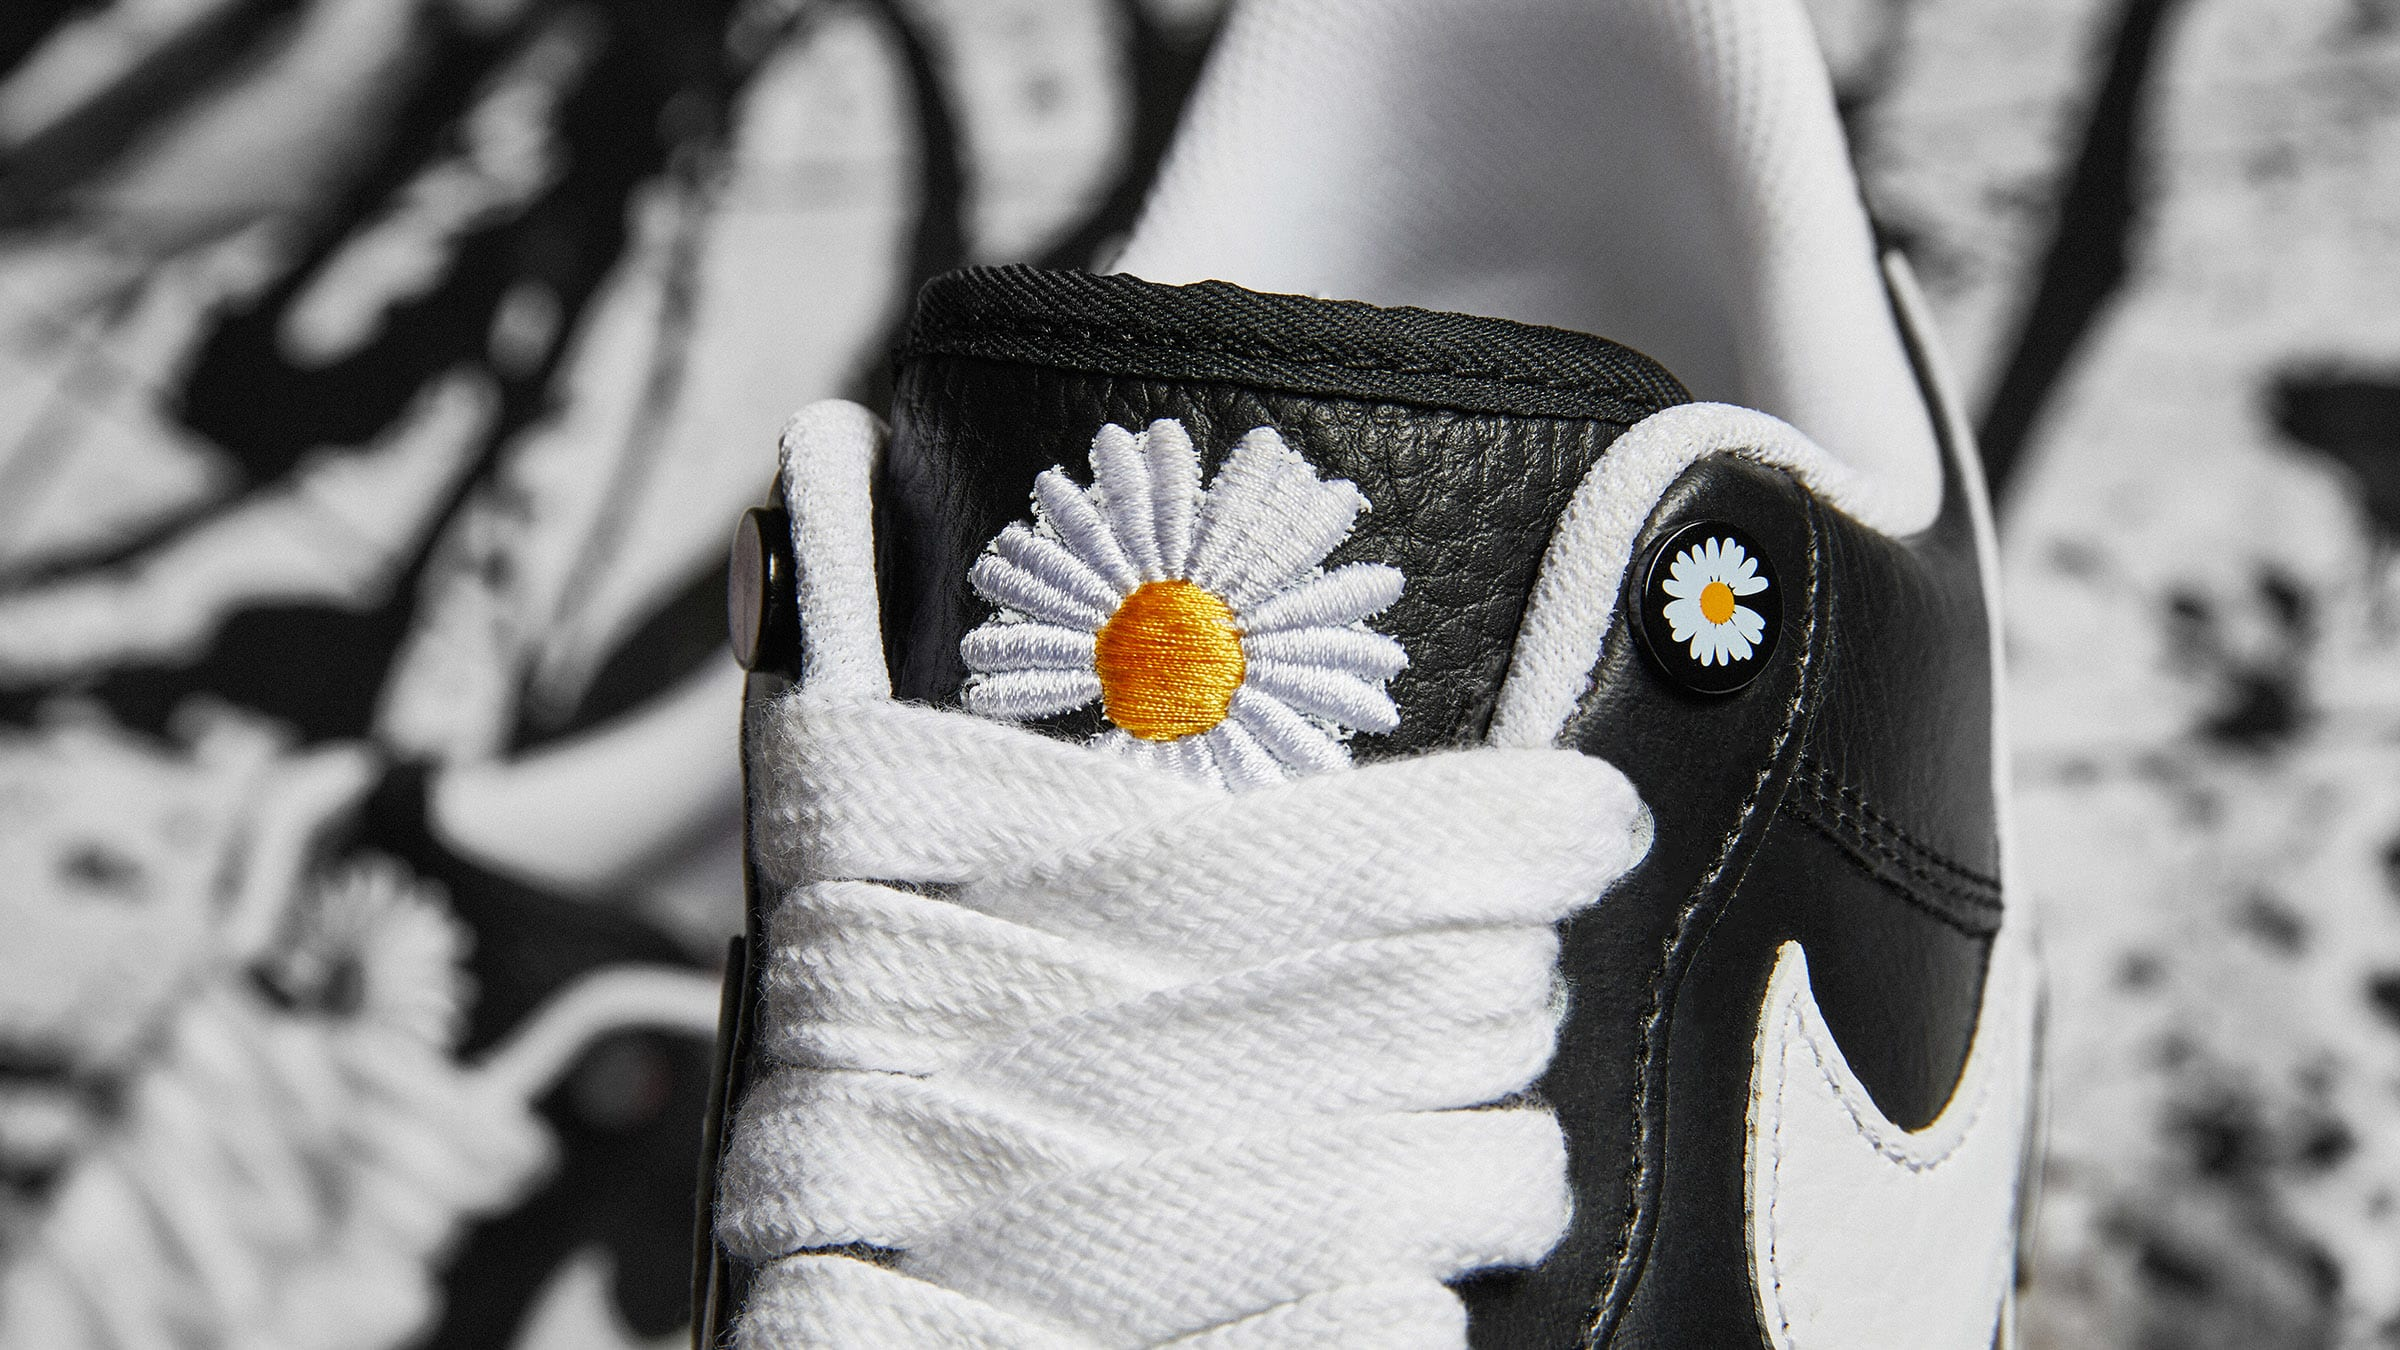 PEACEMINUSONE x Nike Air Force 1 Low